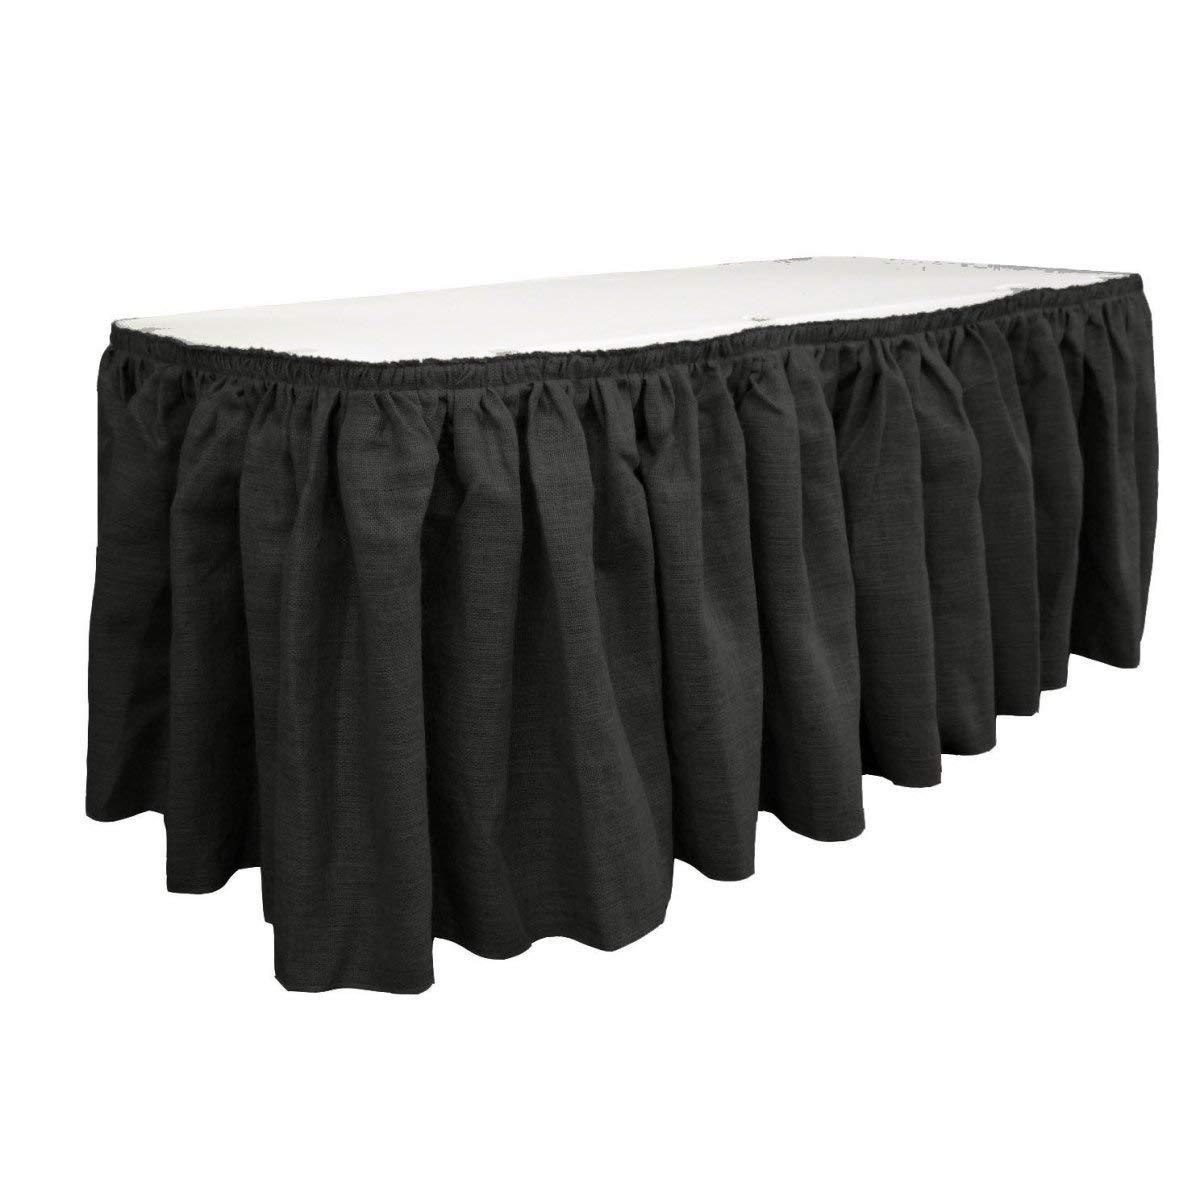 LA Linen SkirtBurlap17x29-10Lclips-Black Burlap Table Skirt with 10 L-Clips44; Black - 17 ft. x 29 in.